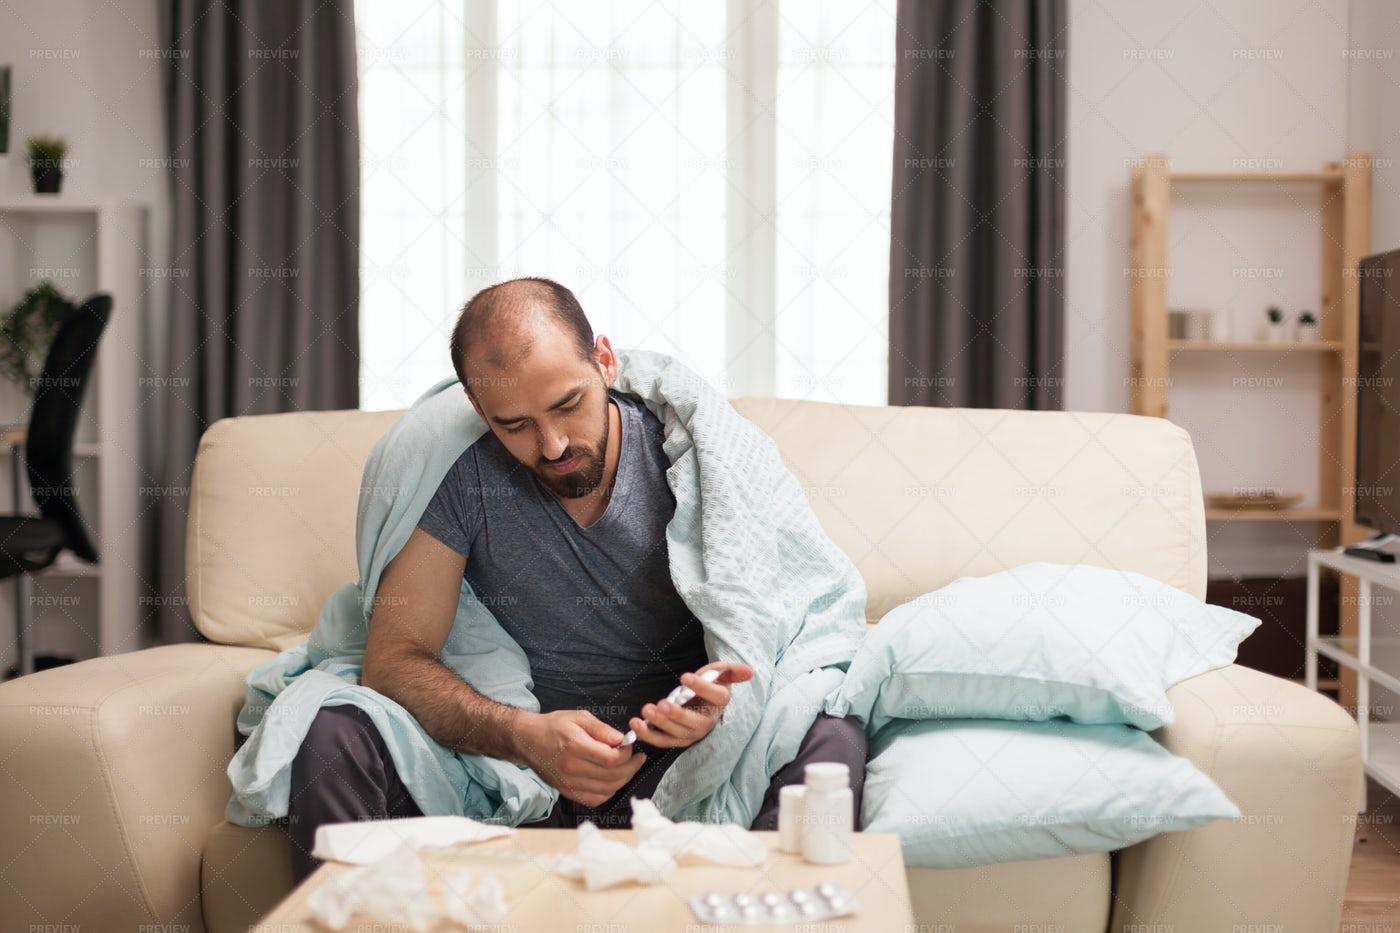 Sick Man Checking His Pills: Stock Photos